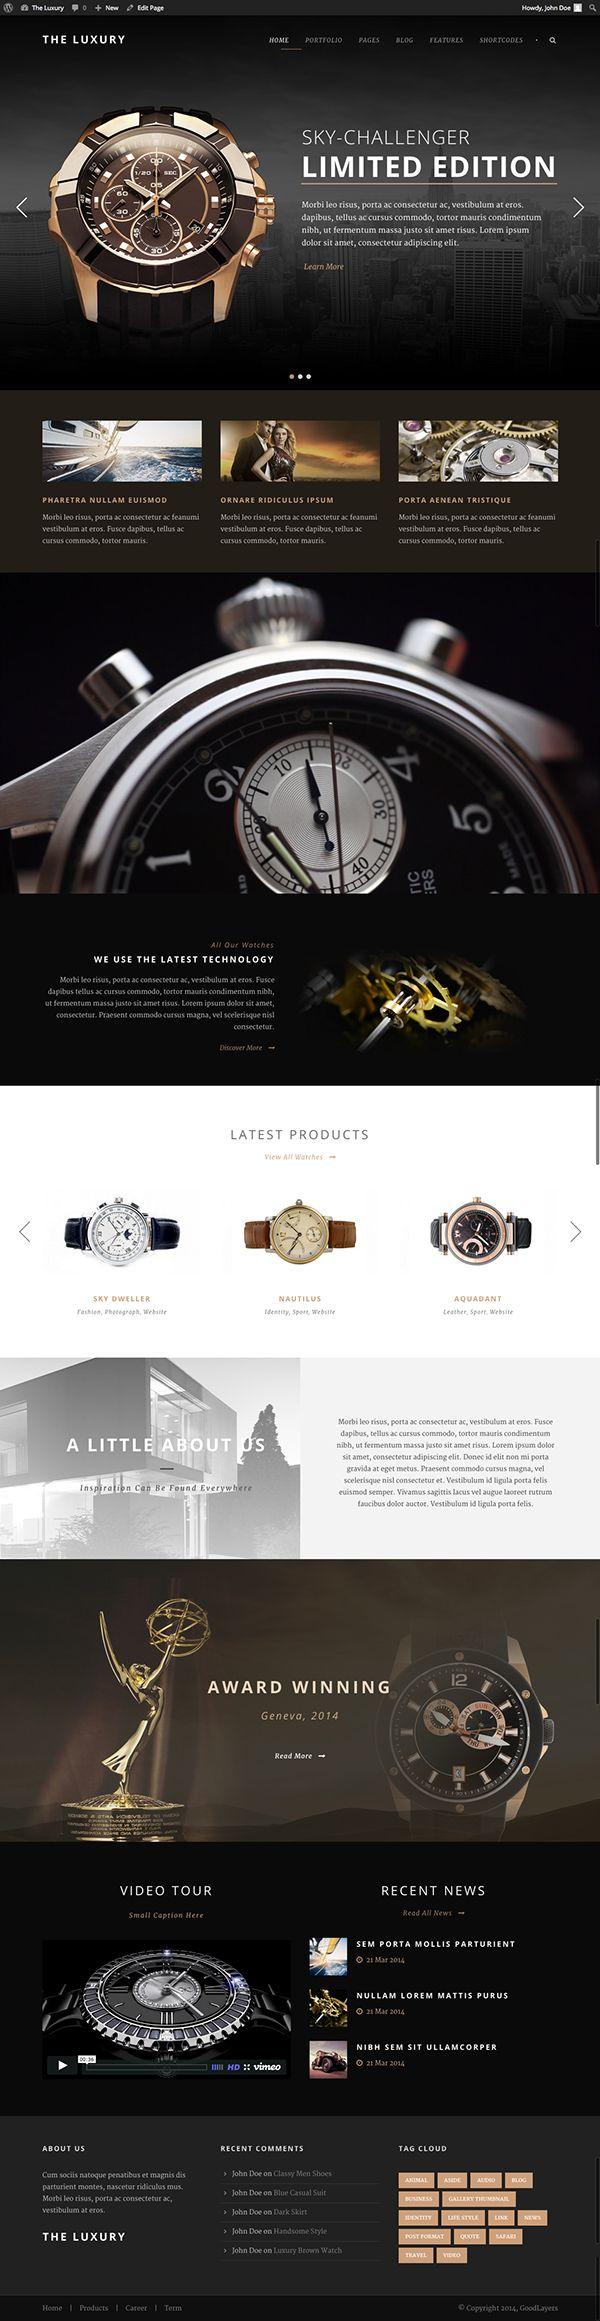 The Luxury - Dark/Light Responsive WordPress Theme on Behance